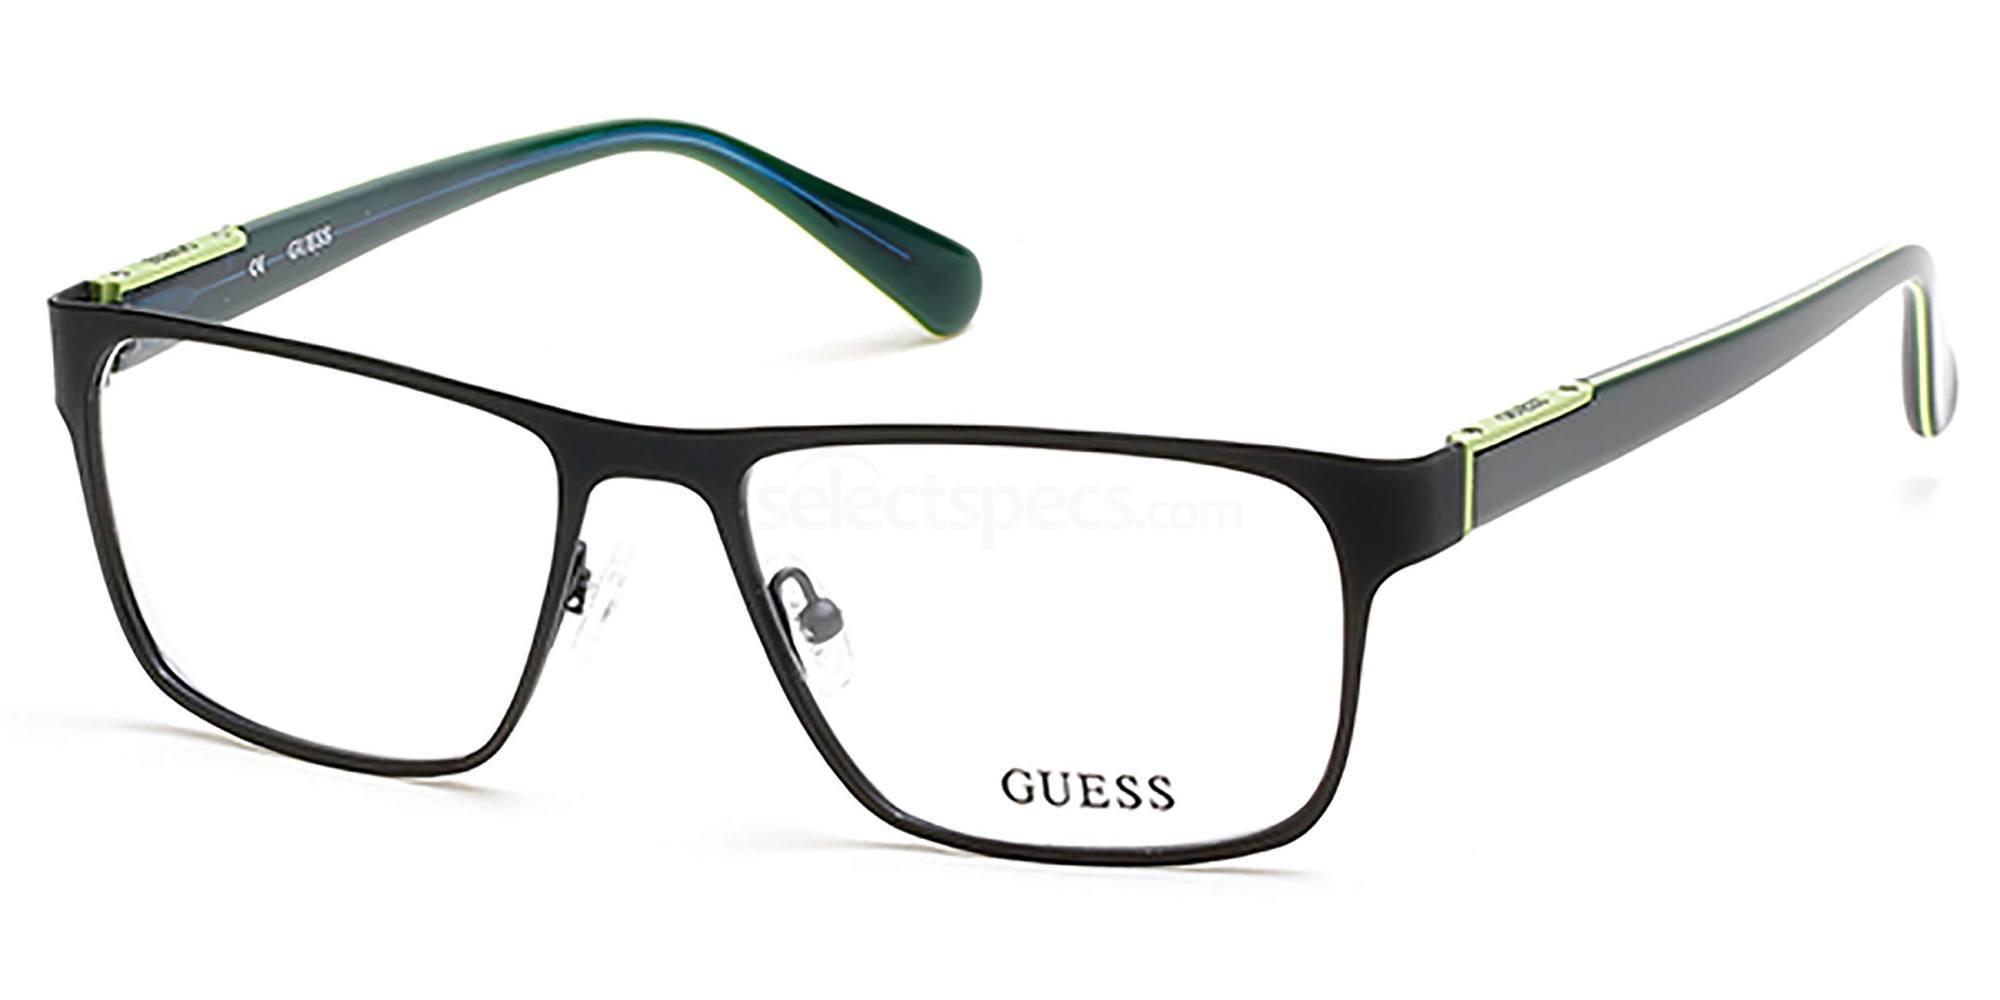 005 GU1882 Glasses, Guess